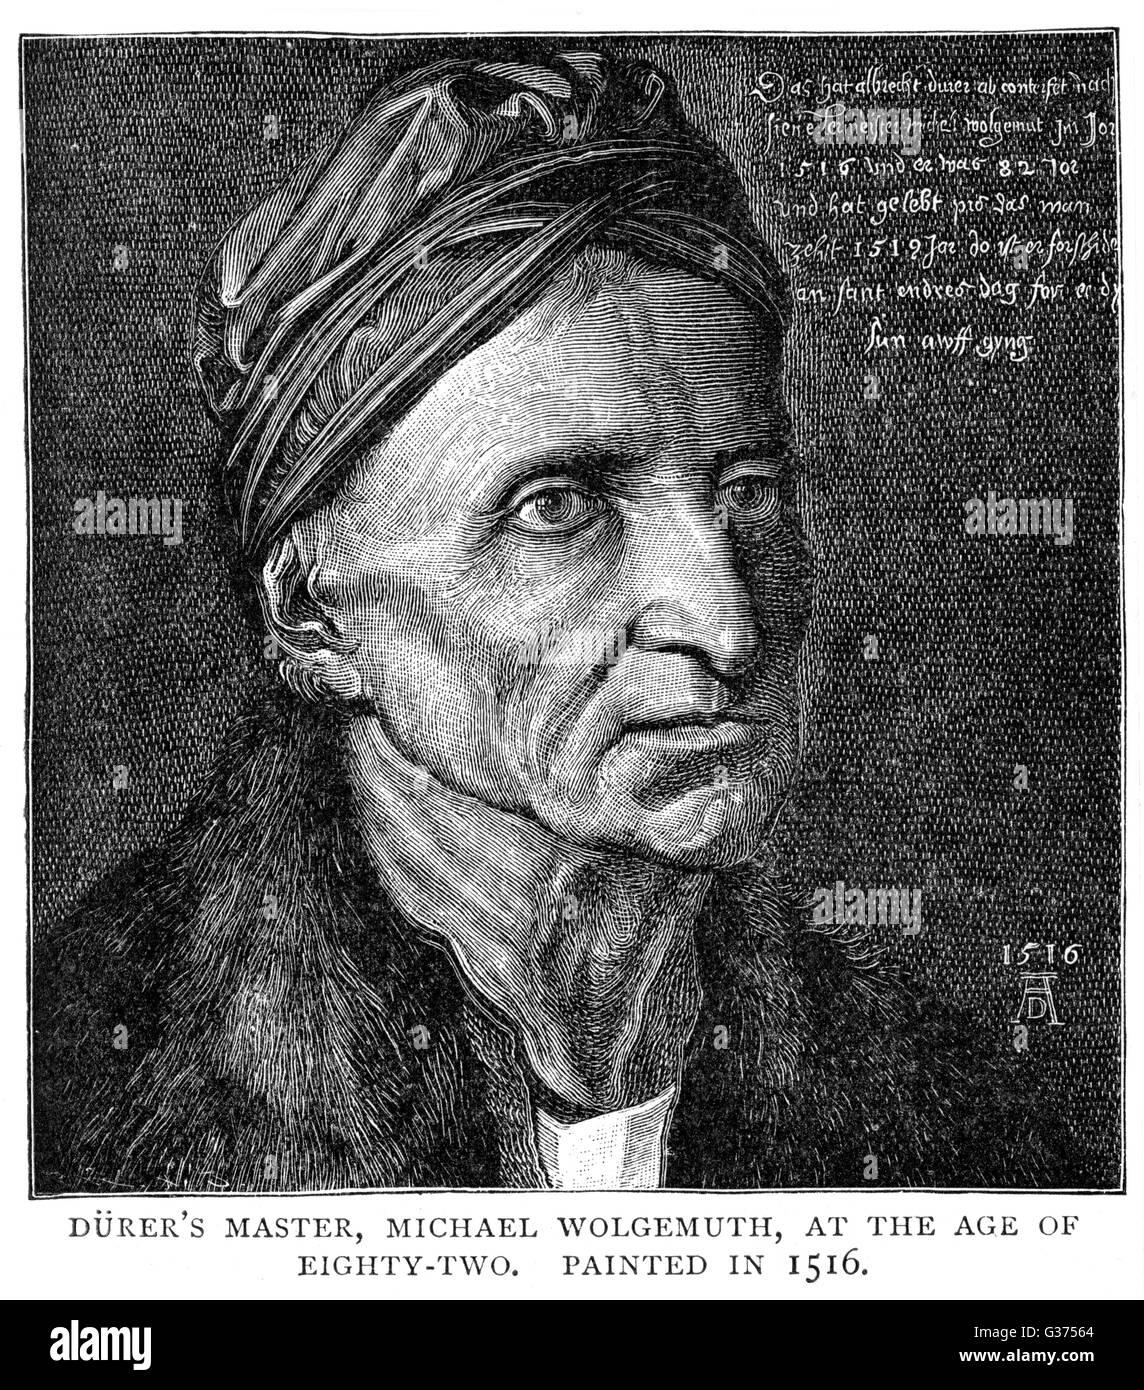 MICHAEL WOLGEMUTH artista tedesco, master di Albrecht Durer data: 1434 - 1519 Immagini Stock